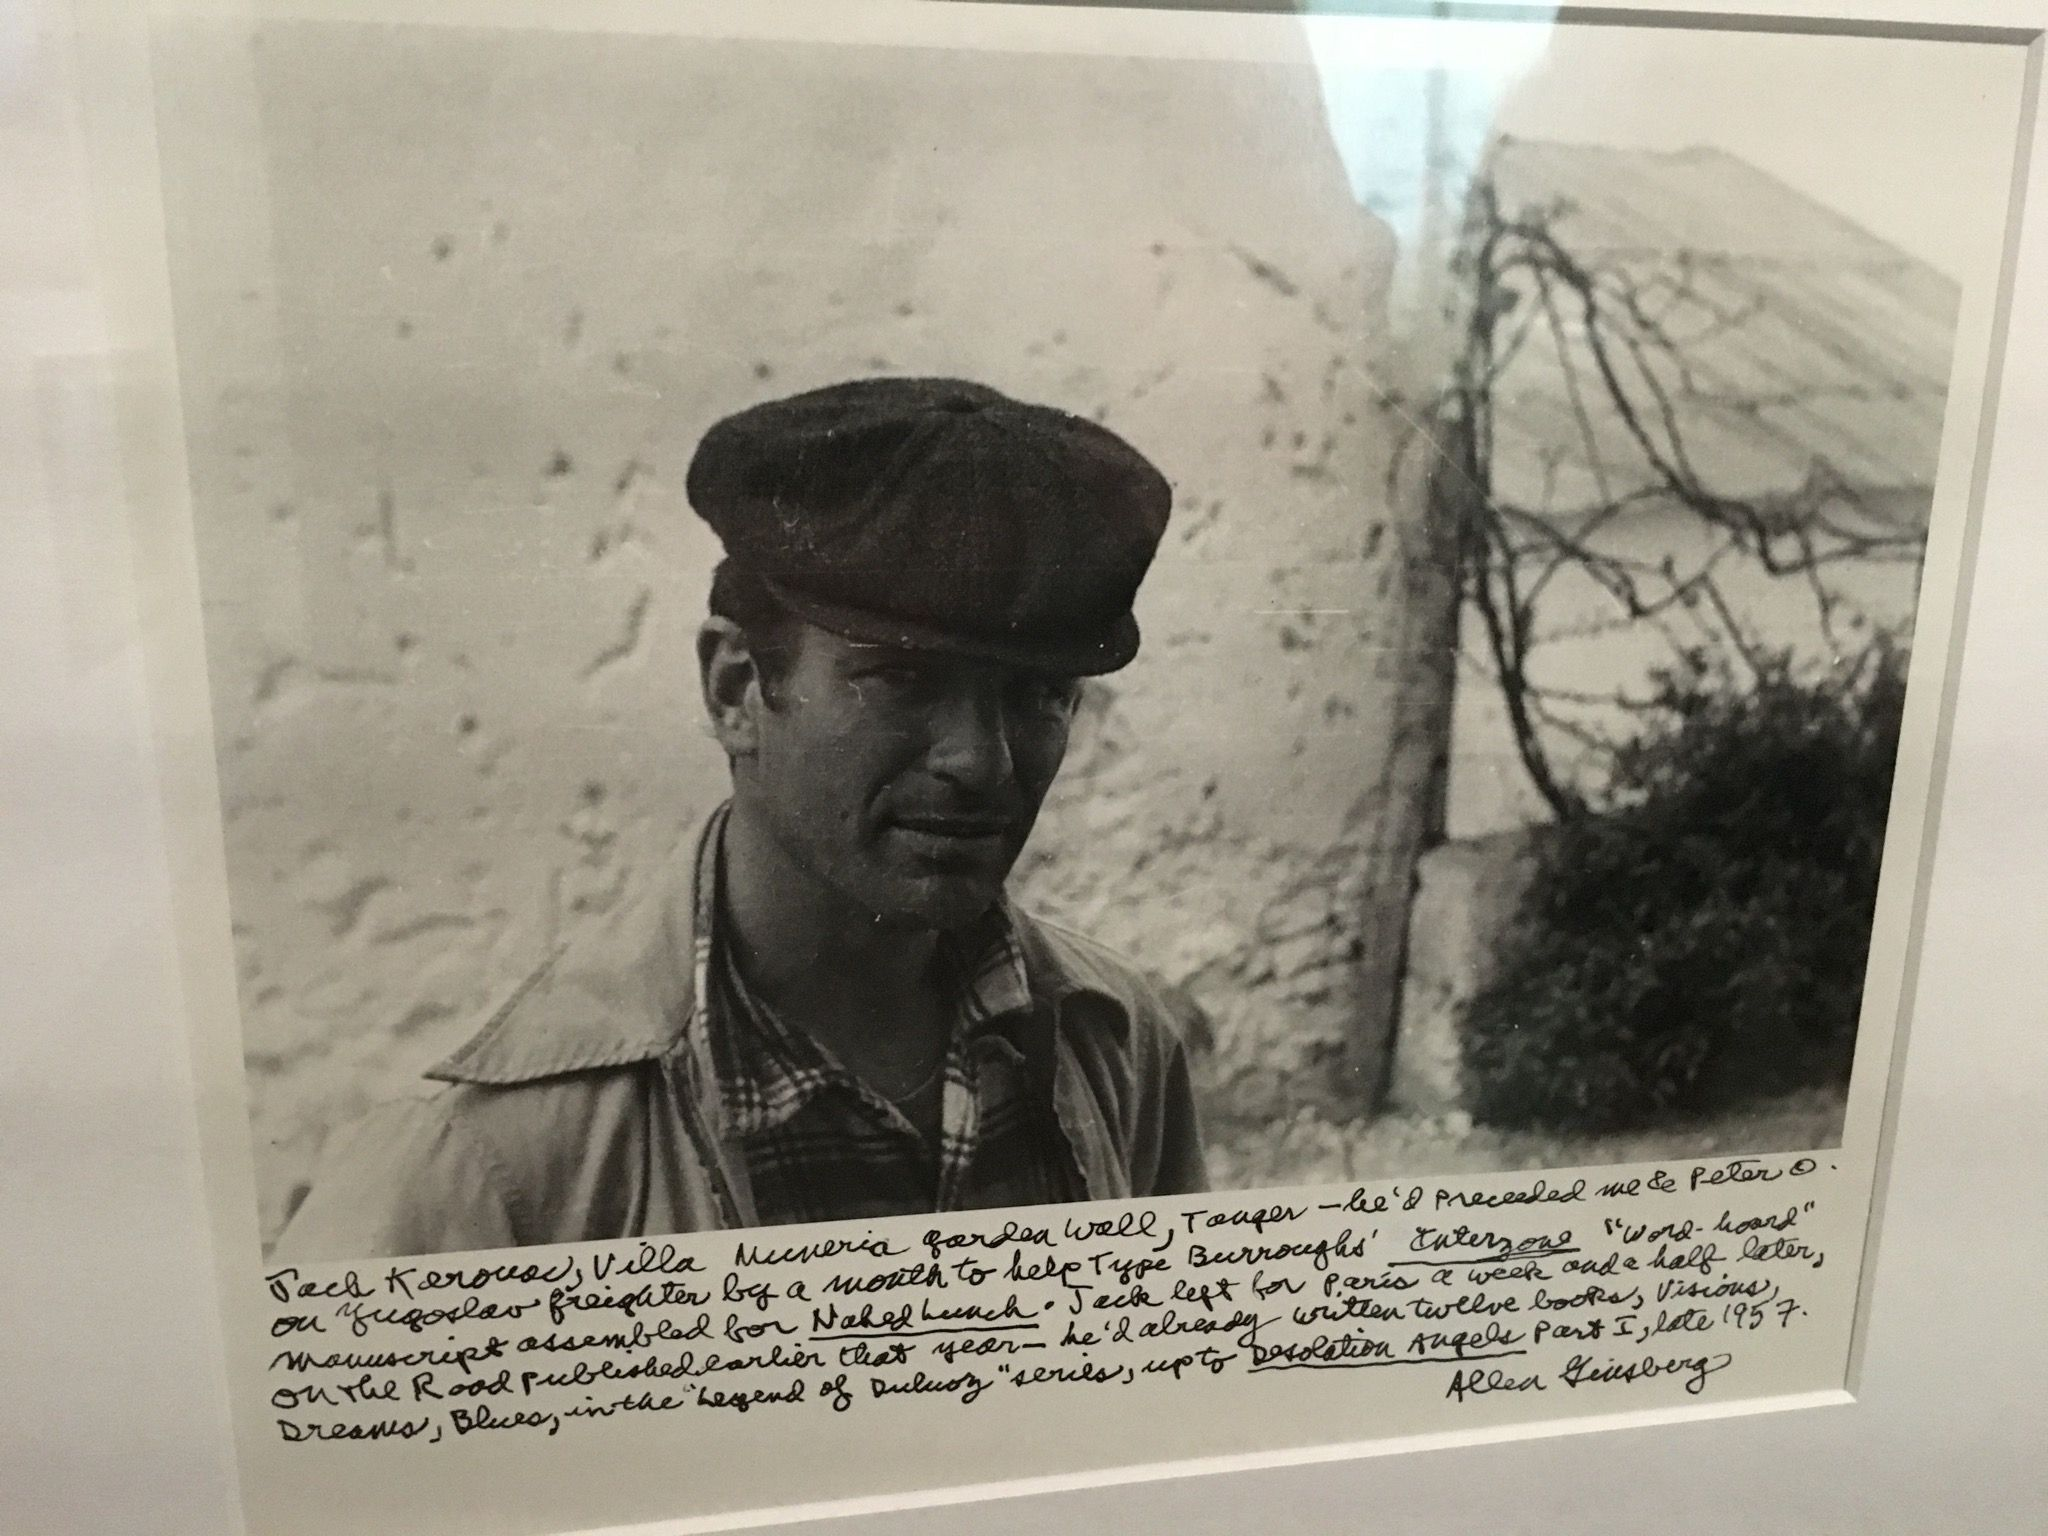 Jack Kerouac à Tanger en 1957 - Photo d'Allen Ginsberg